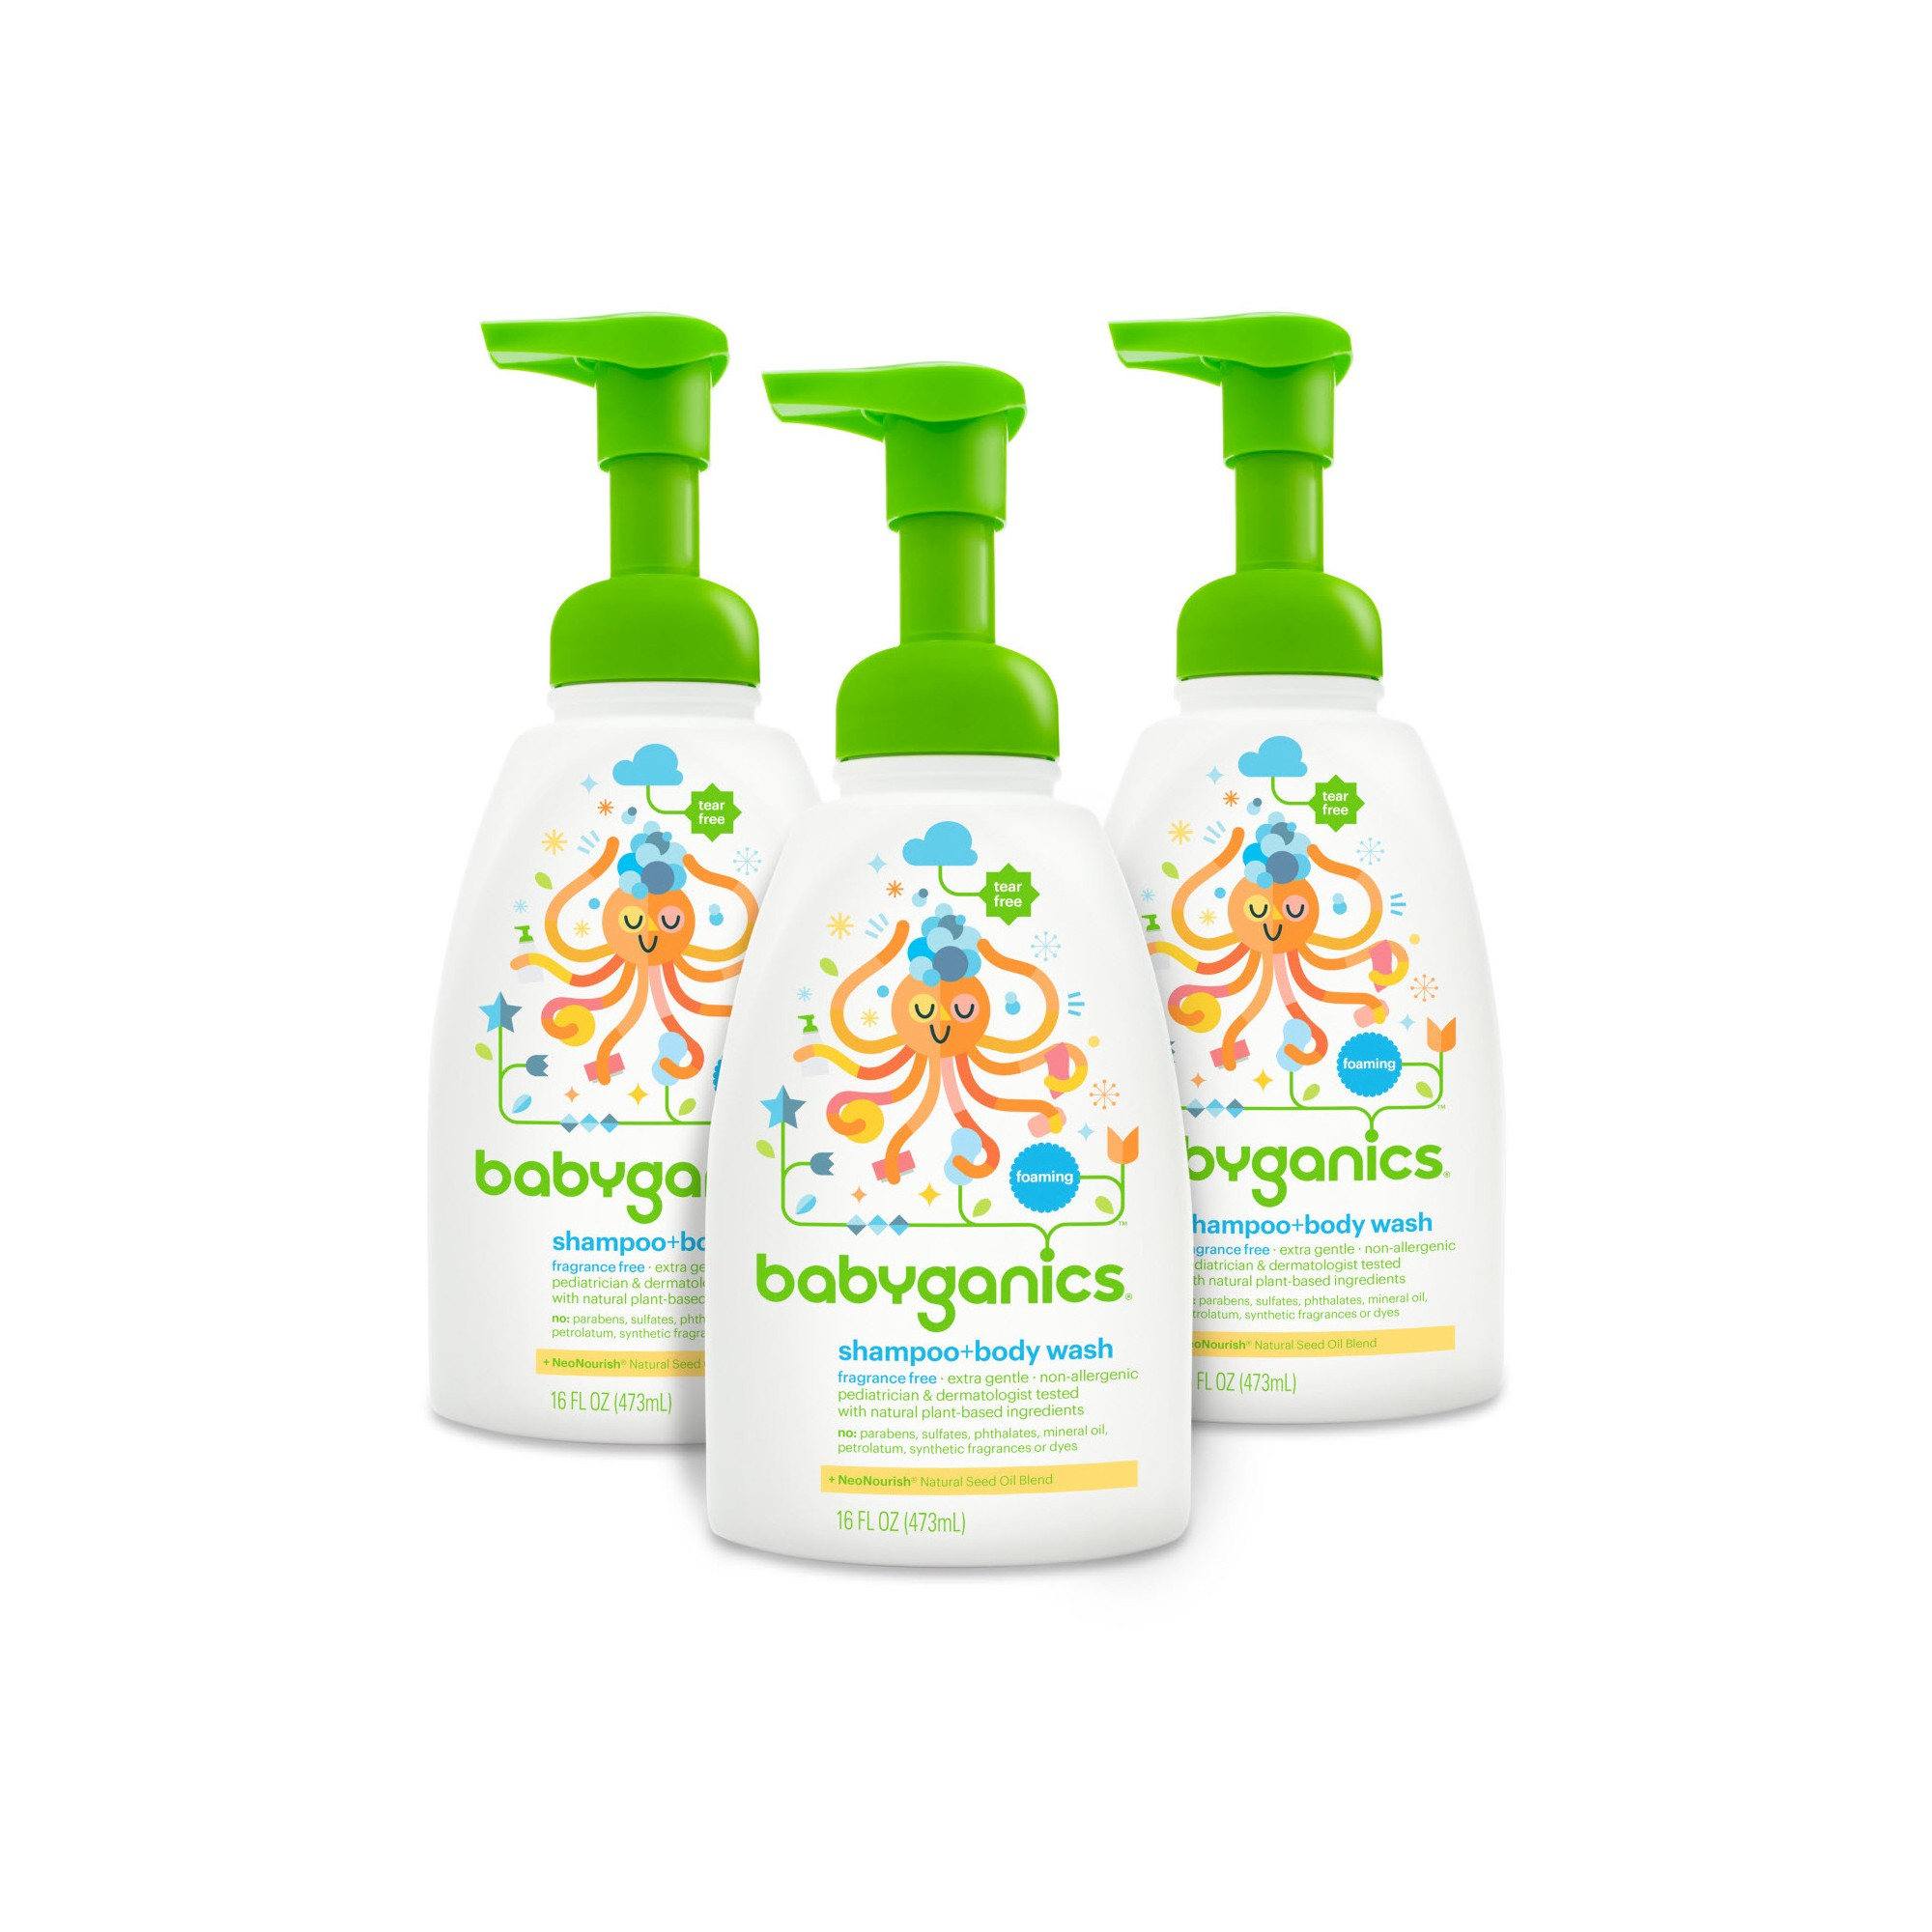 Babyganics Shampoo Body Wash Fragrance Free 16oz 3pk Shampoo Body Wash Fragrance Free Products Fragrance Free Shampoo